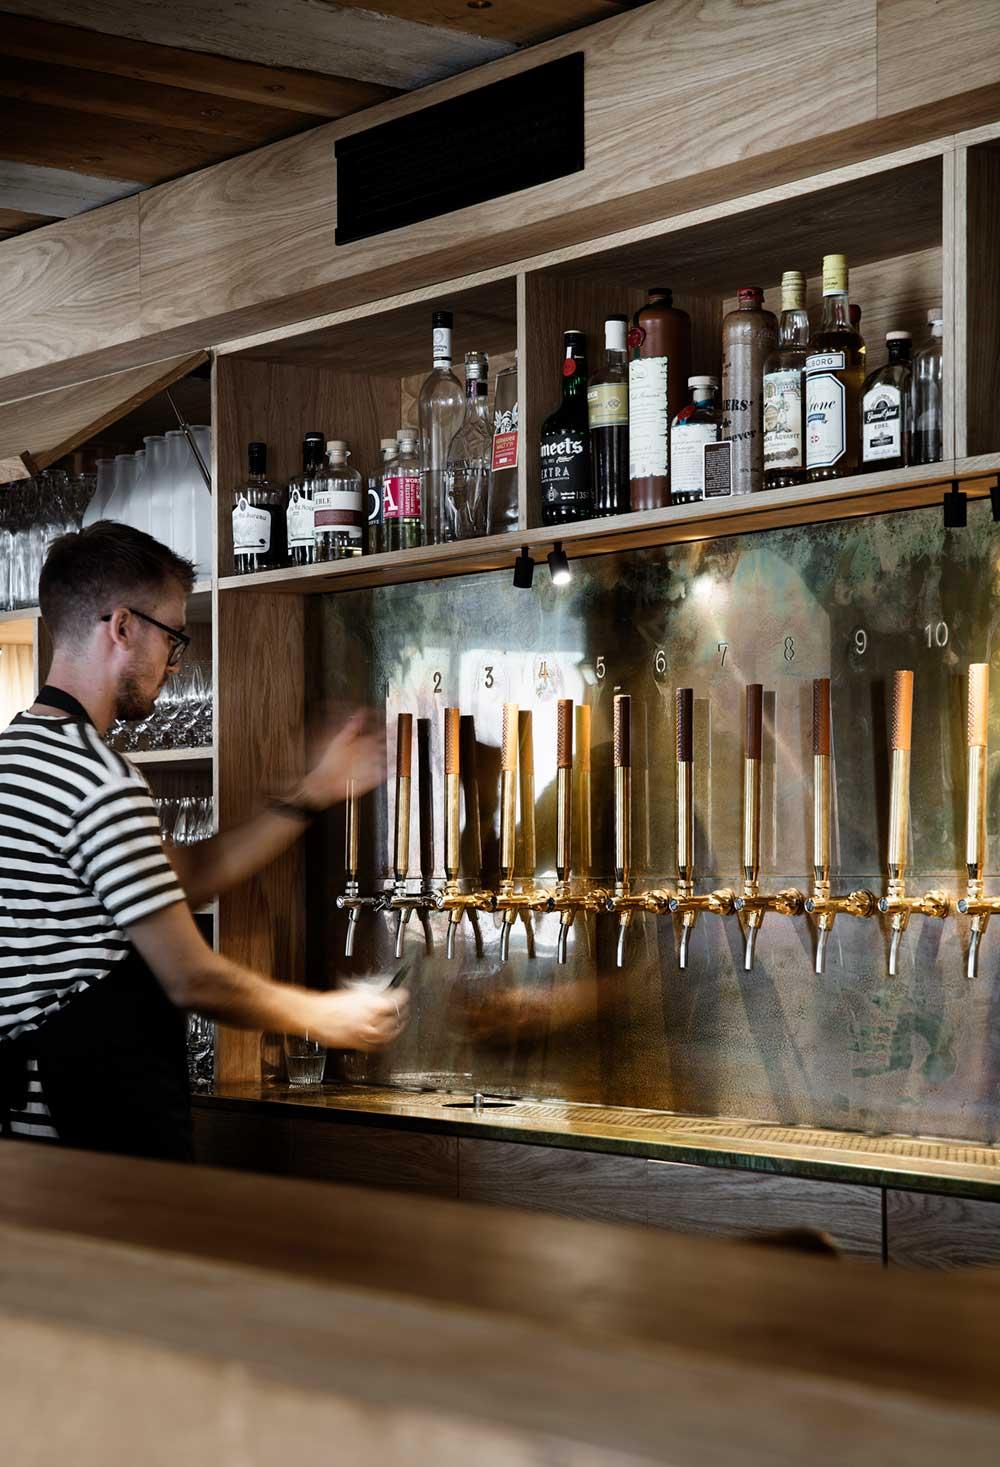 restaurant bar interior design barr - Barr Interior Design